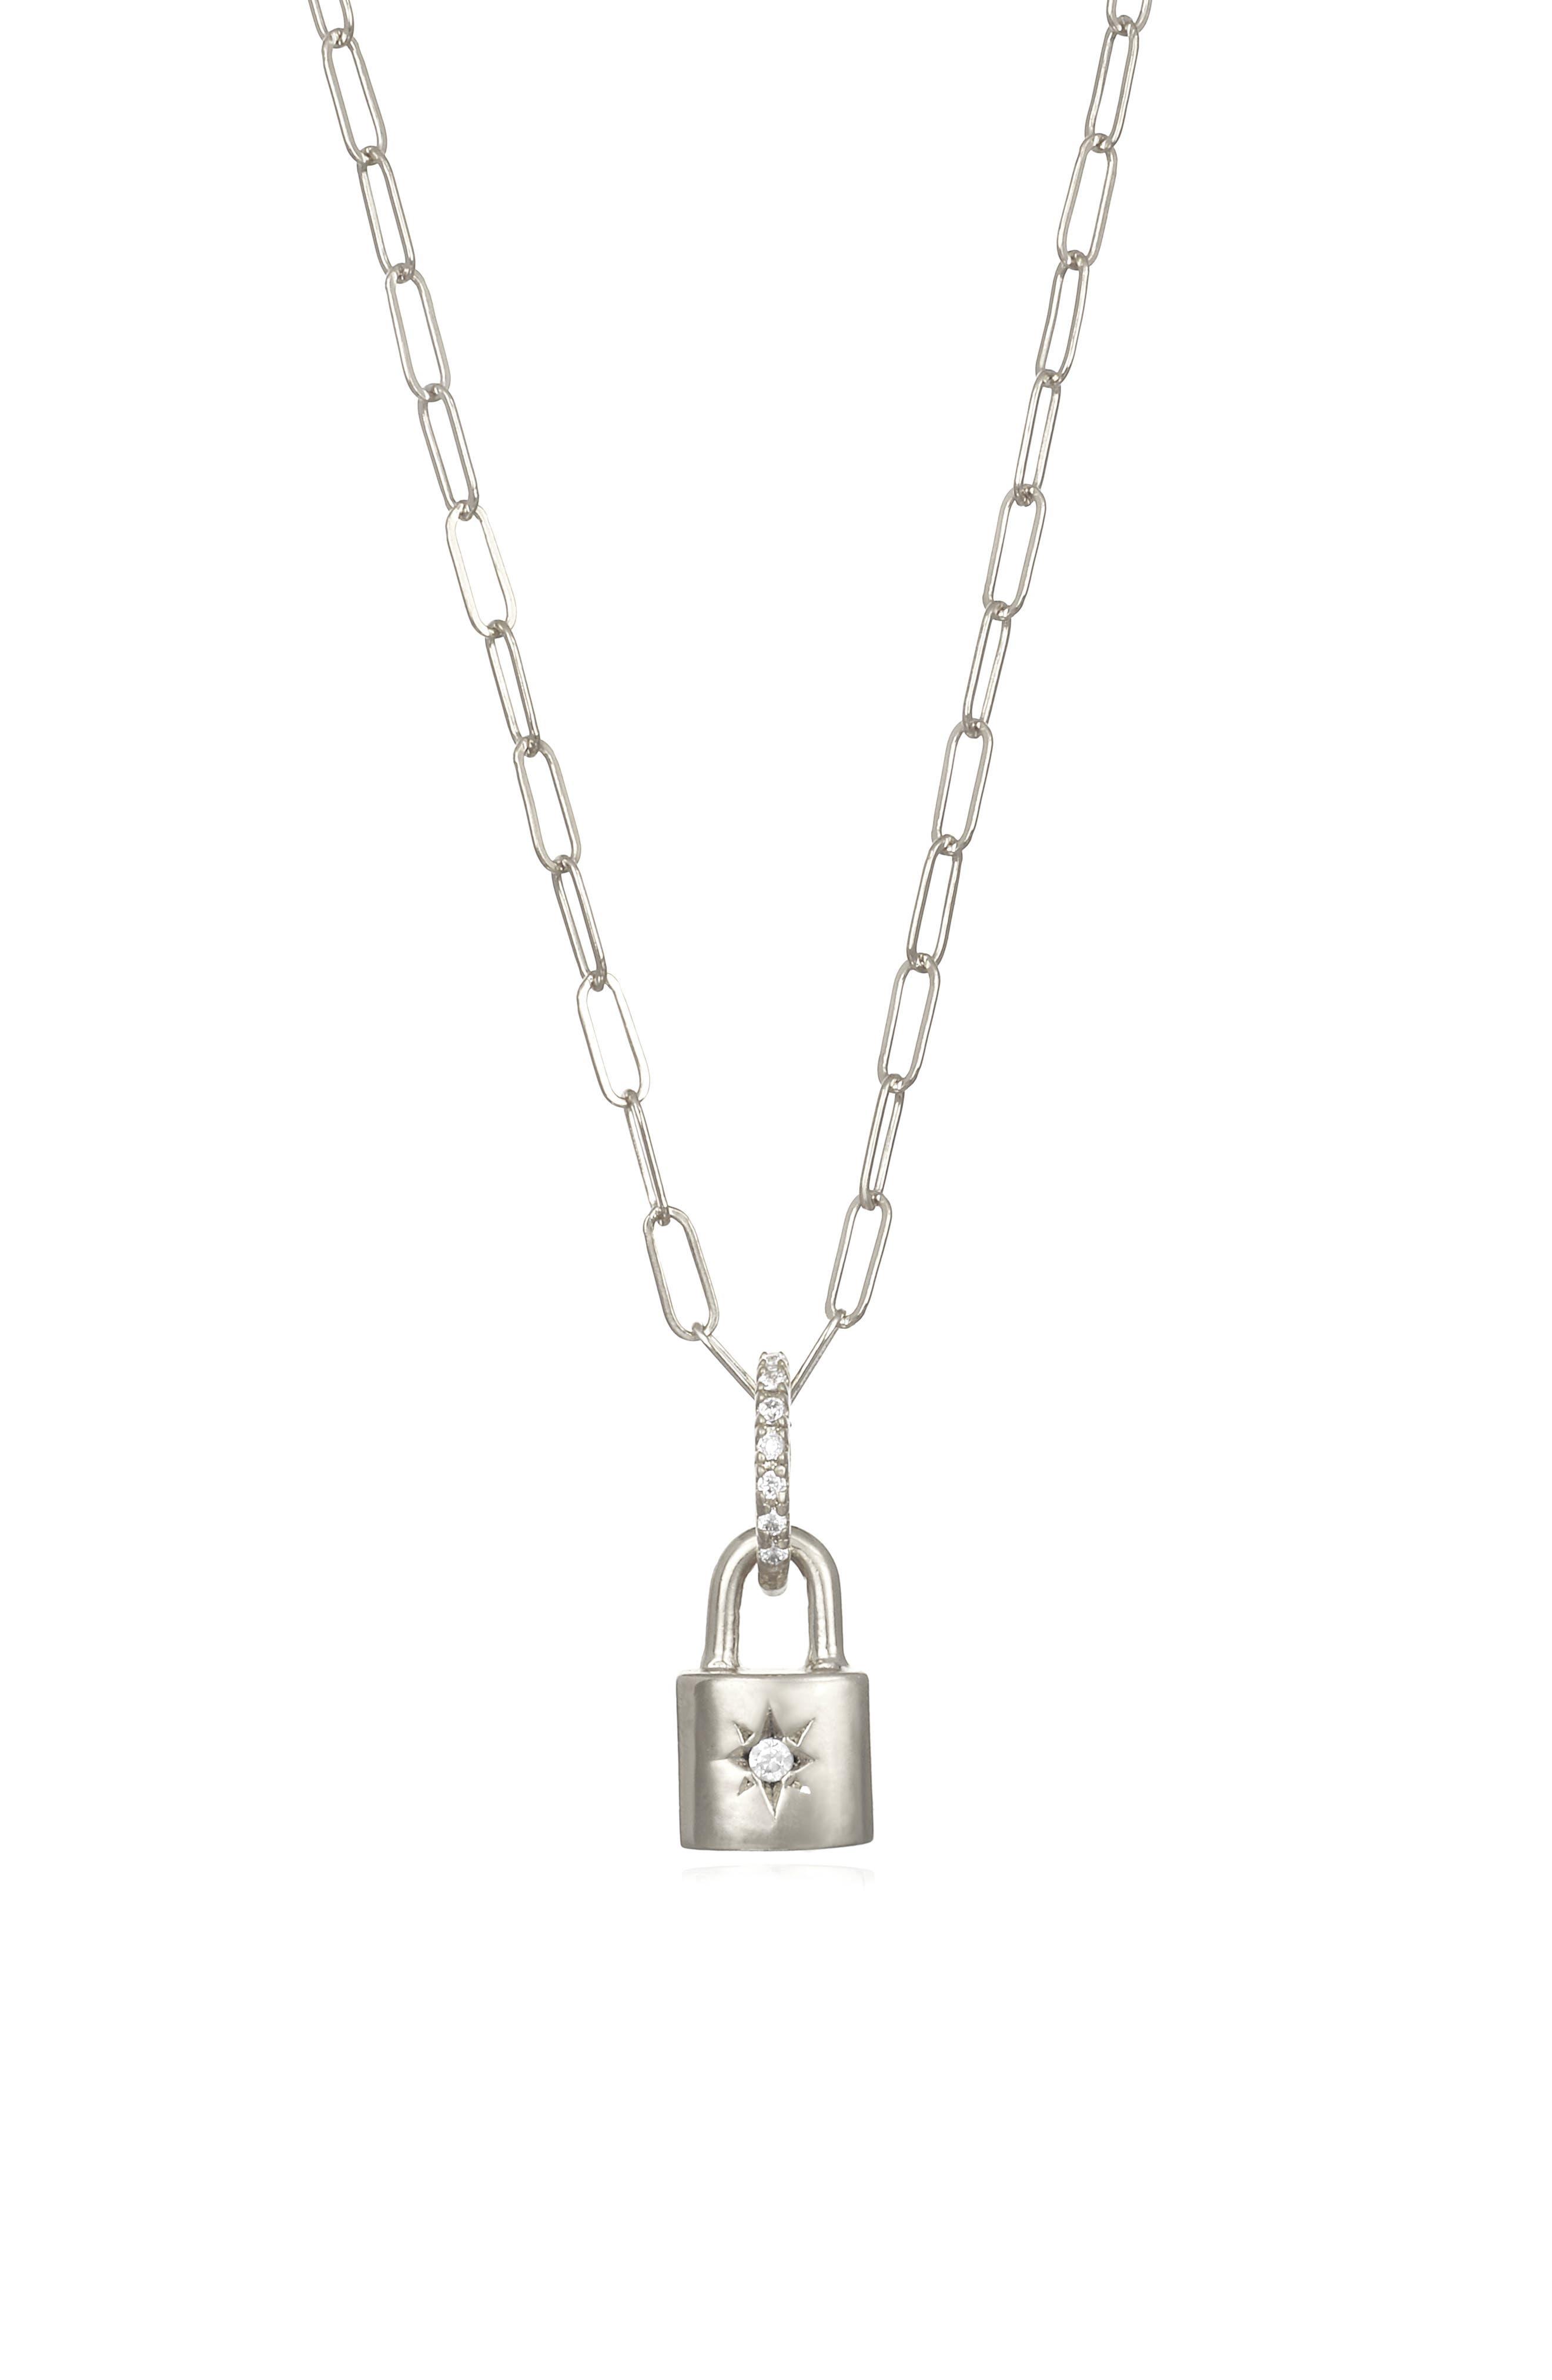 Amelia Rose Starburst Padlock Pendant Necklace in Silver at Nordstrom